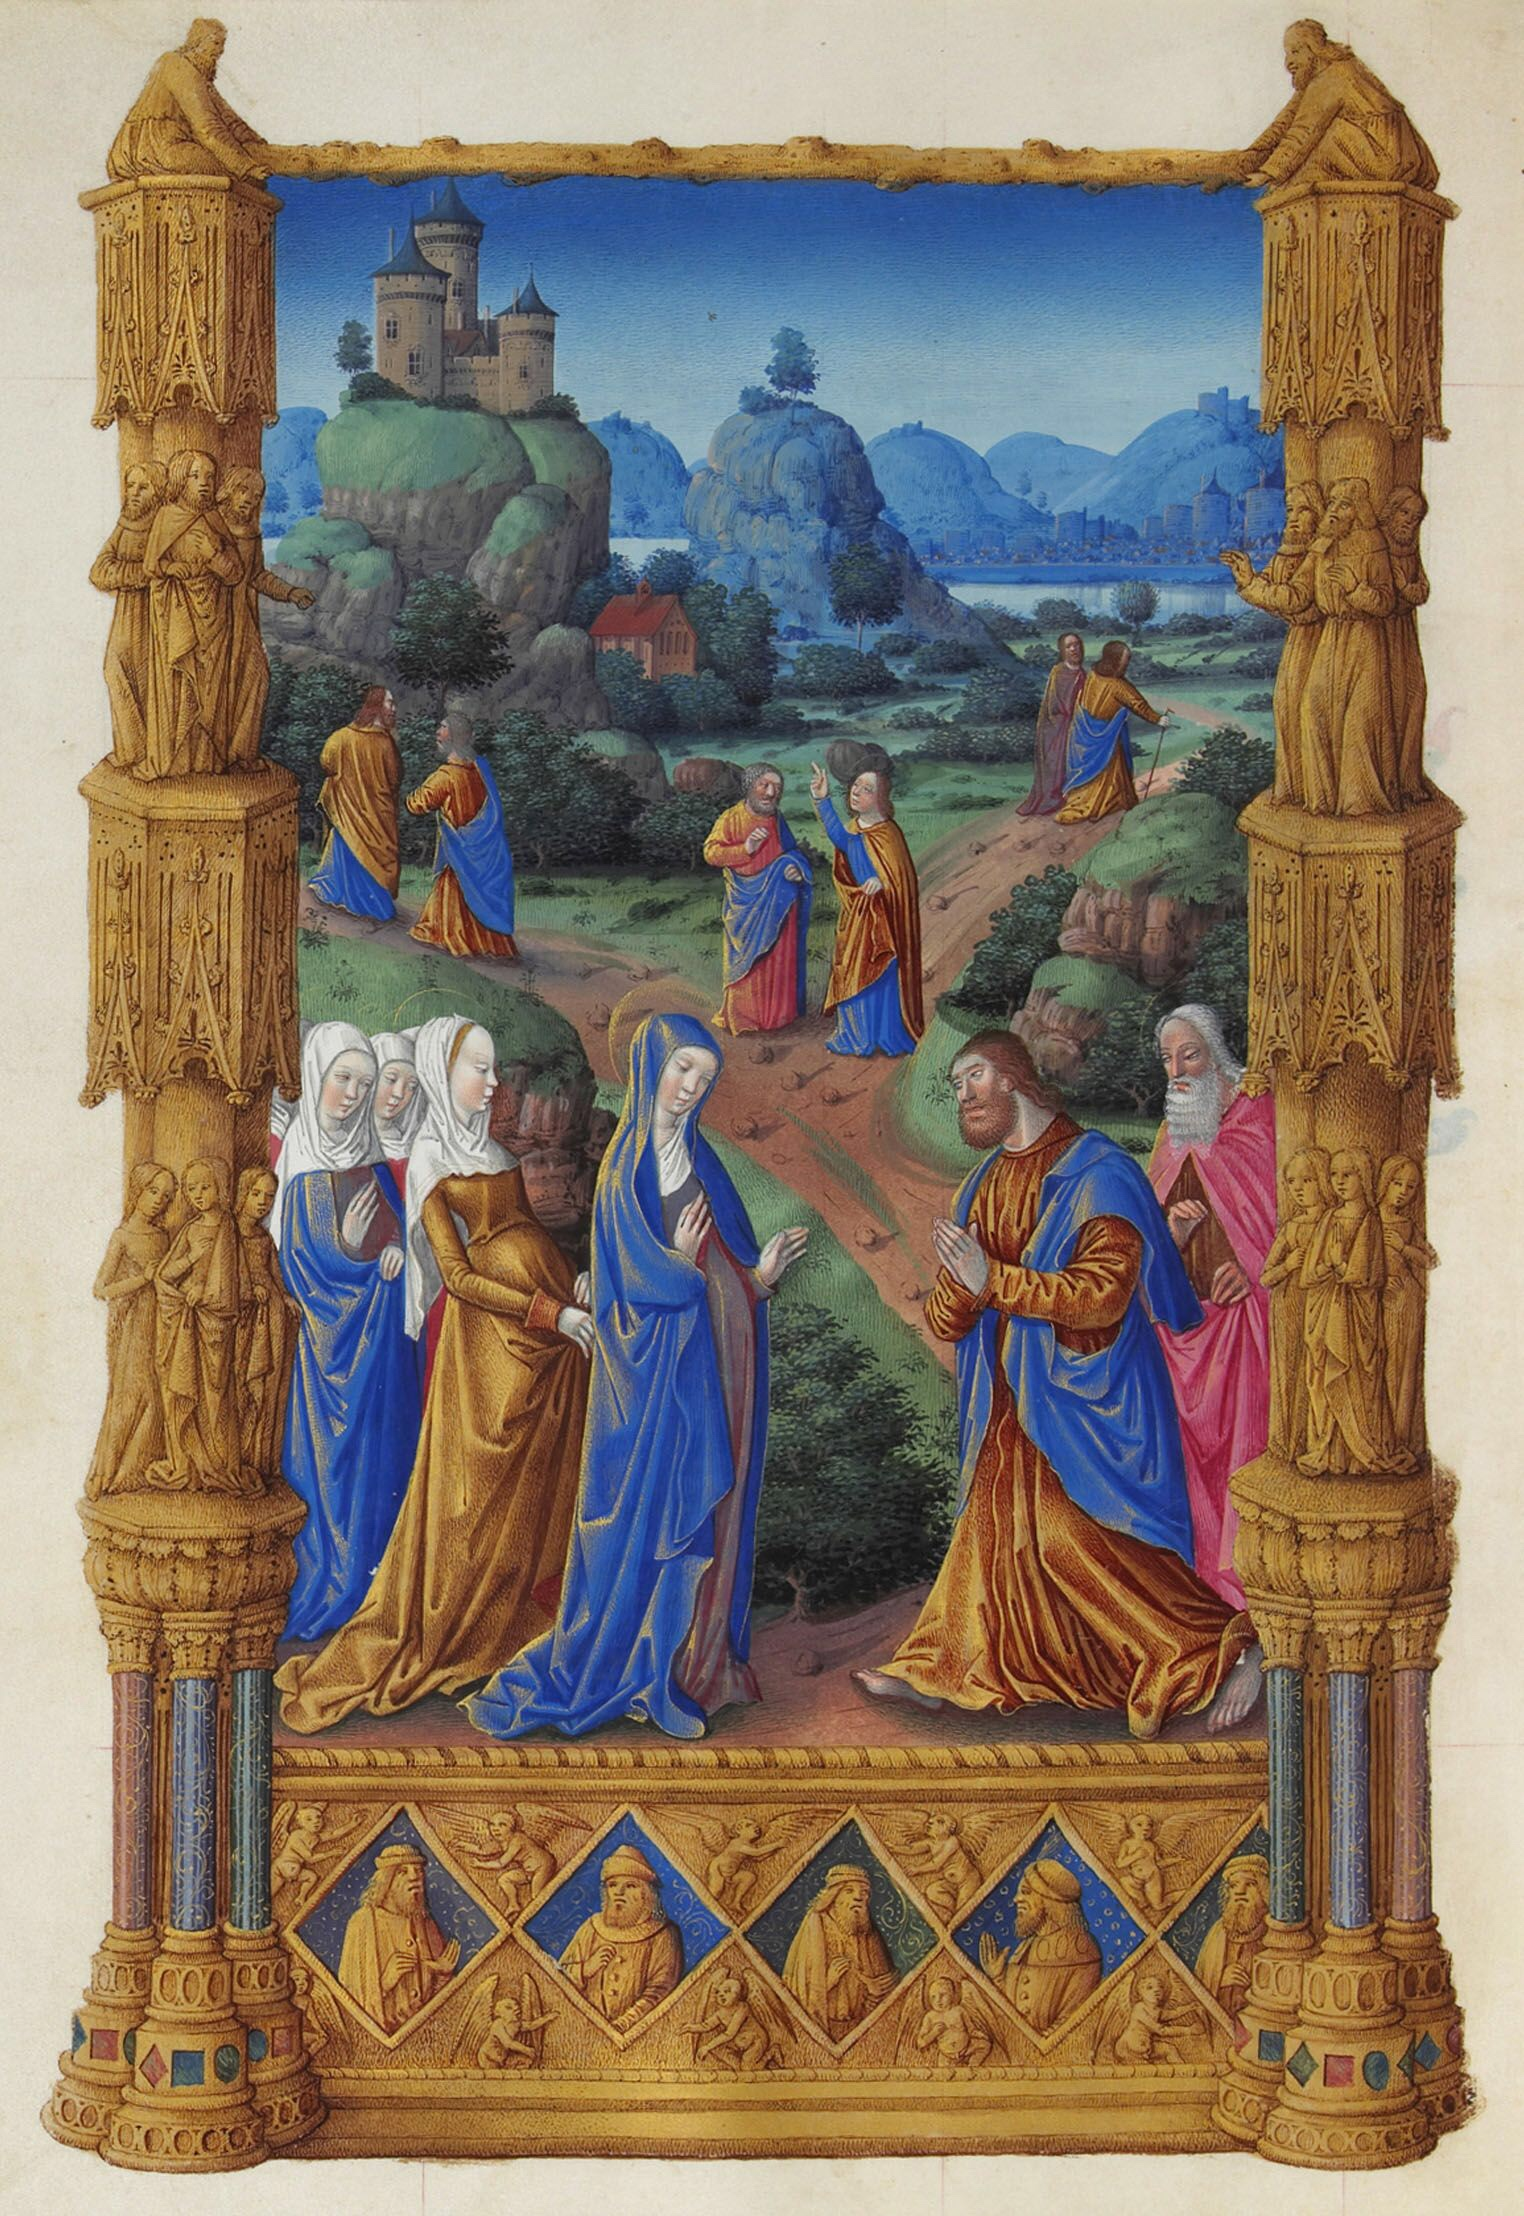 Les Très Riches Heures du duc de Berry, Folio 122v - The Apostles Going Forth to Preach the Musée Condé, Chantilly.  Category:Très Riches Heures du Duc de Berry . This work of art is in the Public Domain. {{ PD-US }}